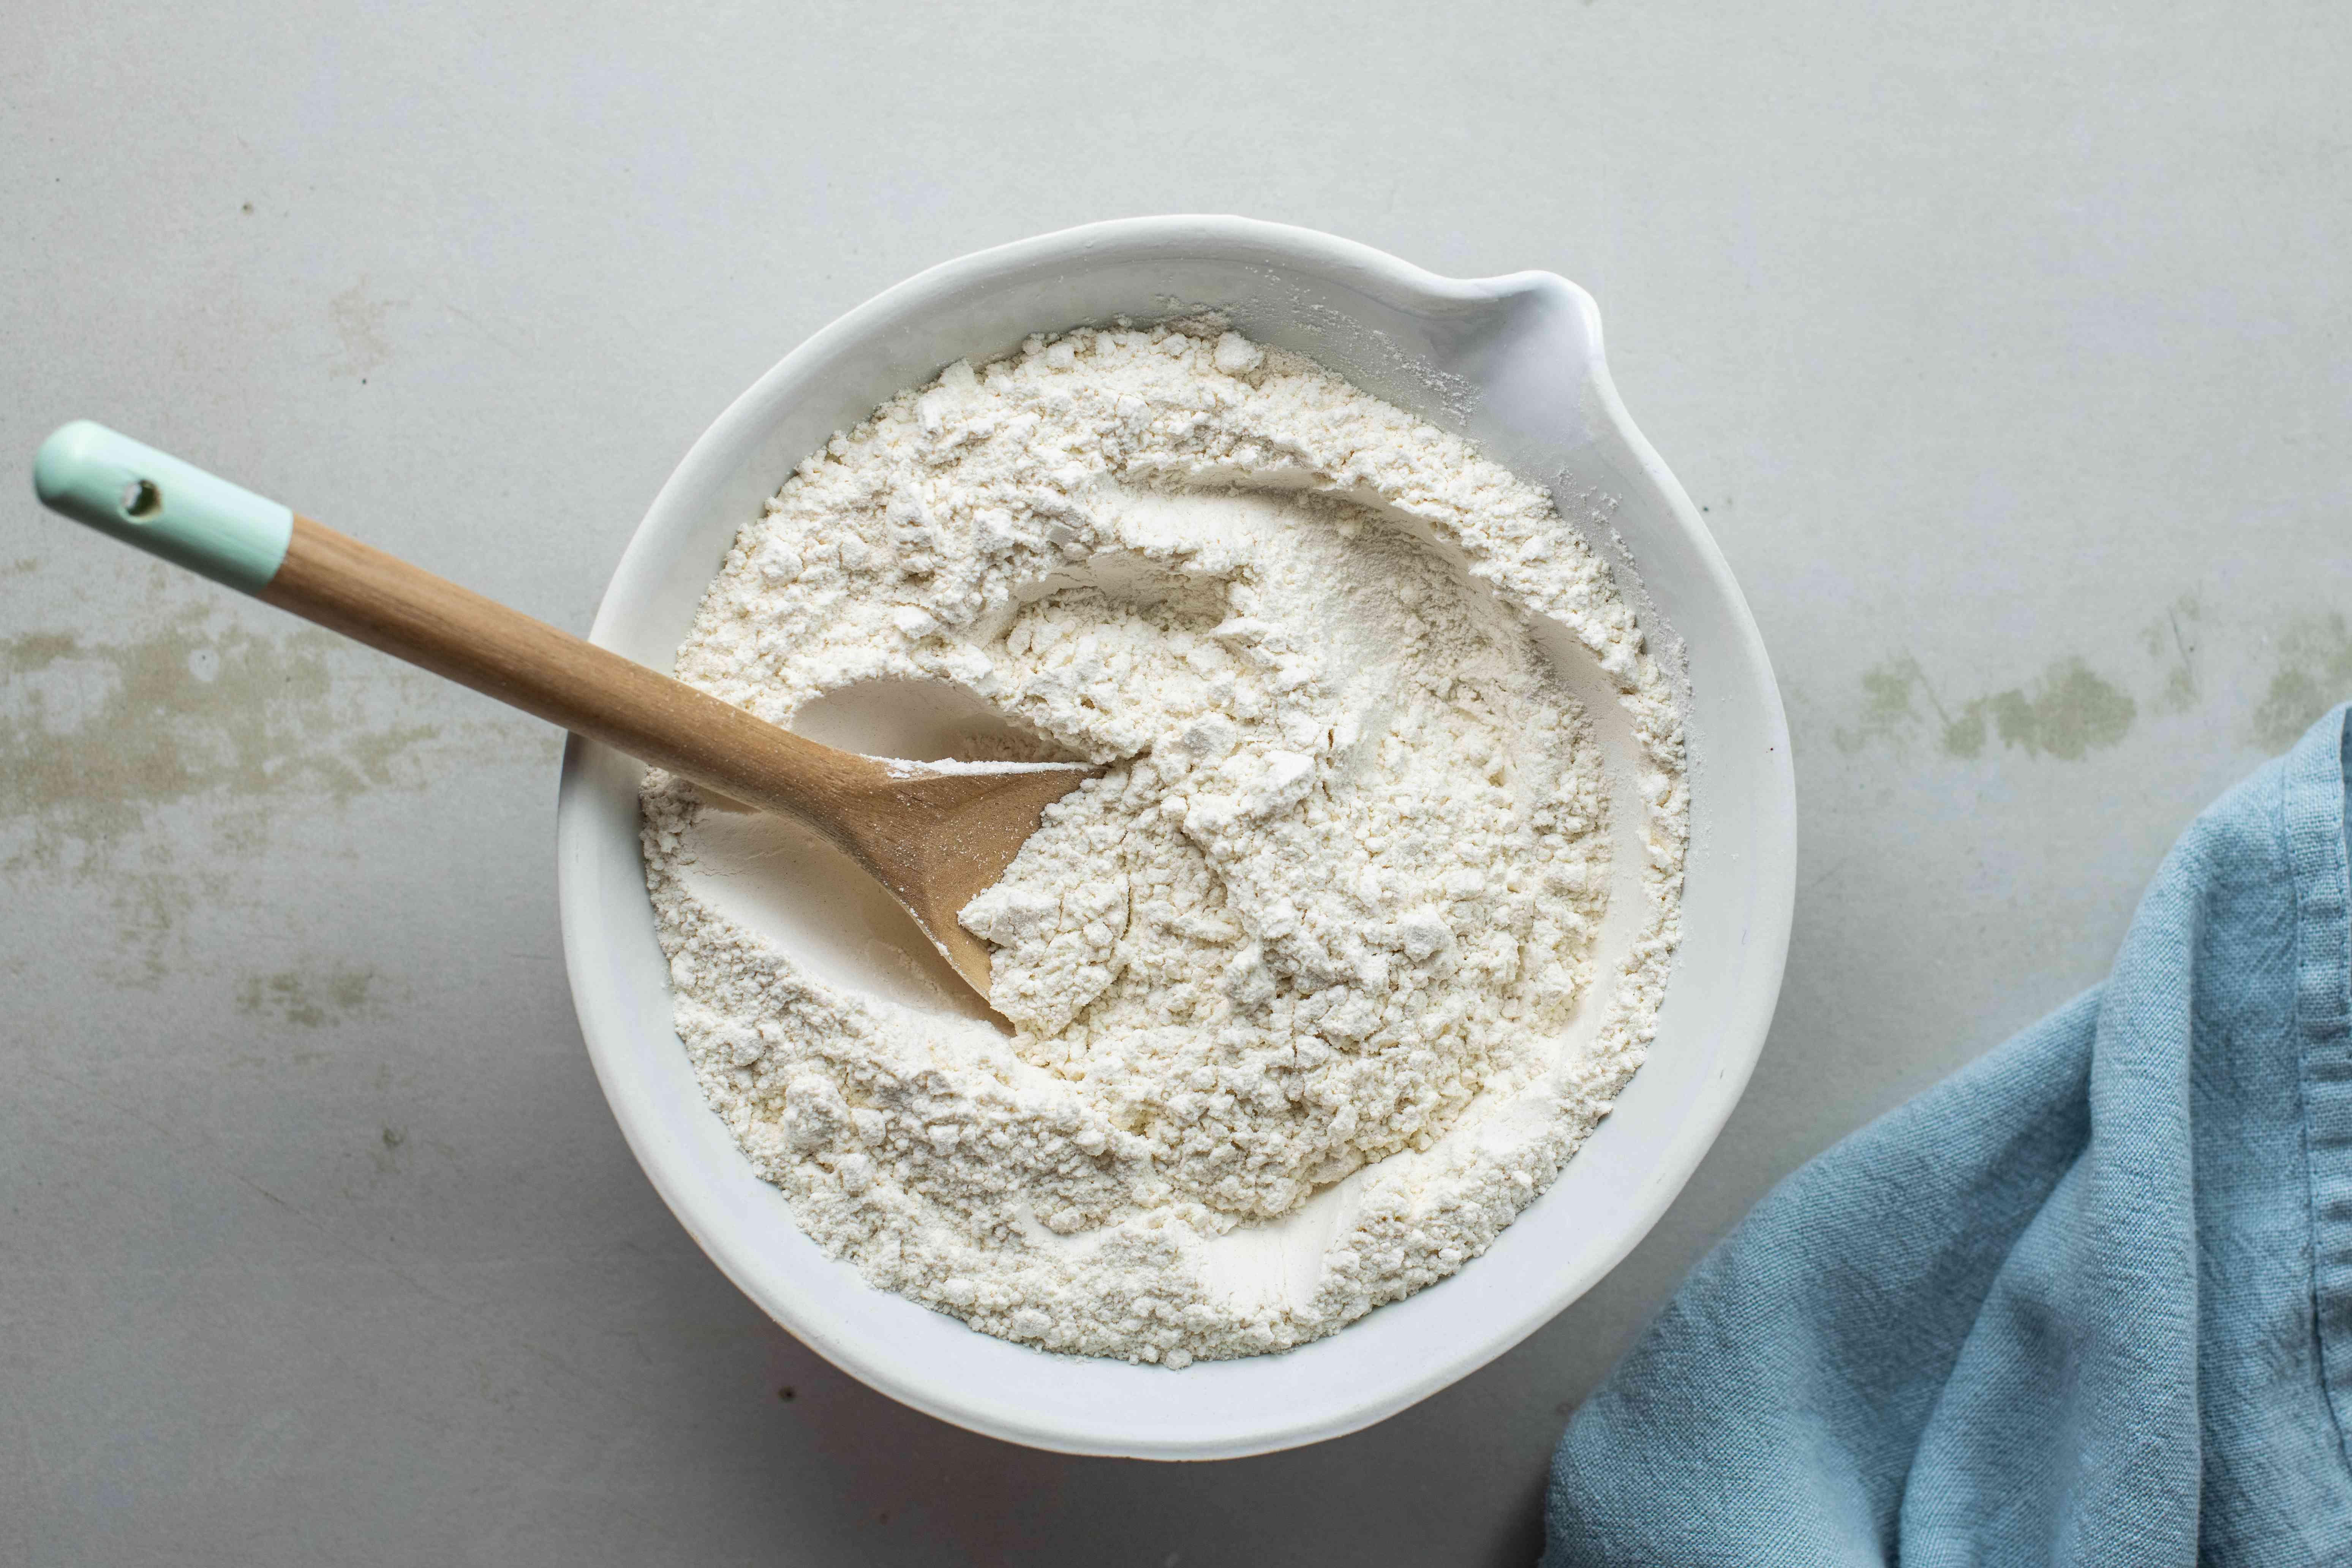 Mix flour and baking powder